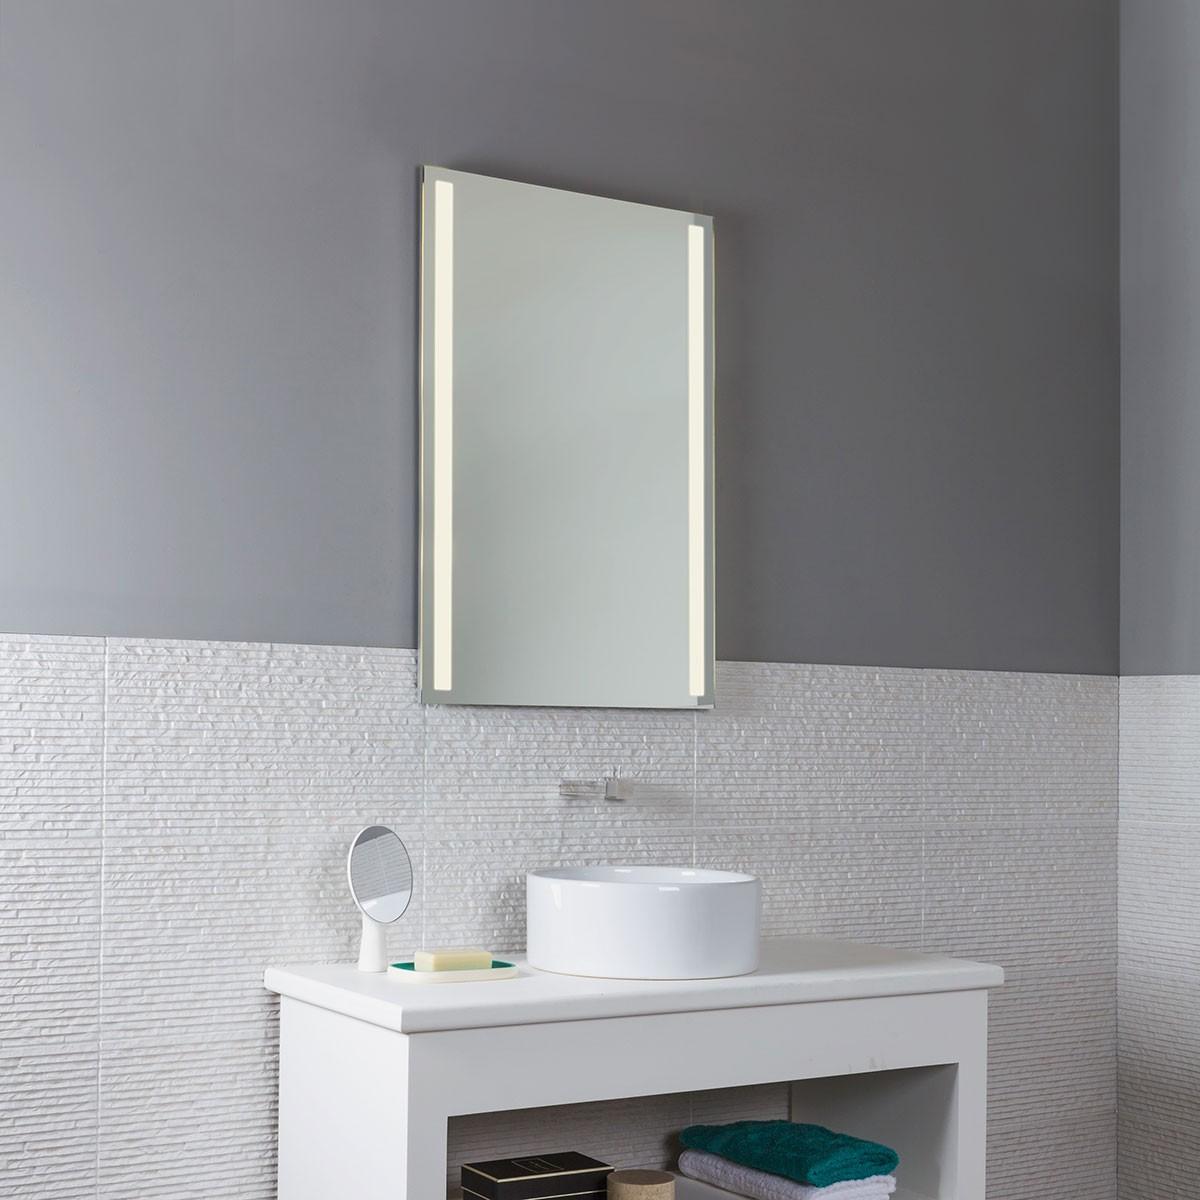 Astro Avlon 900 Led Bathroom Mirror Light At Uk Electrical Supplies